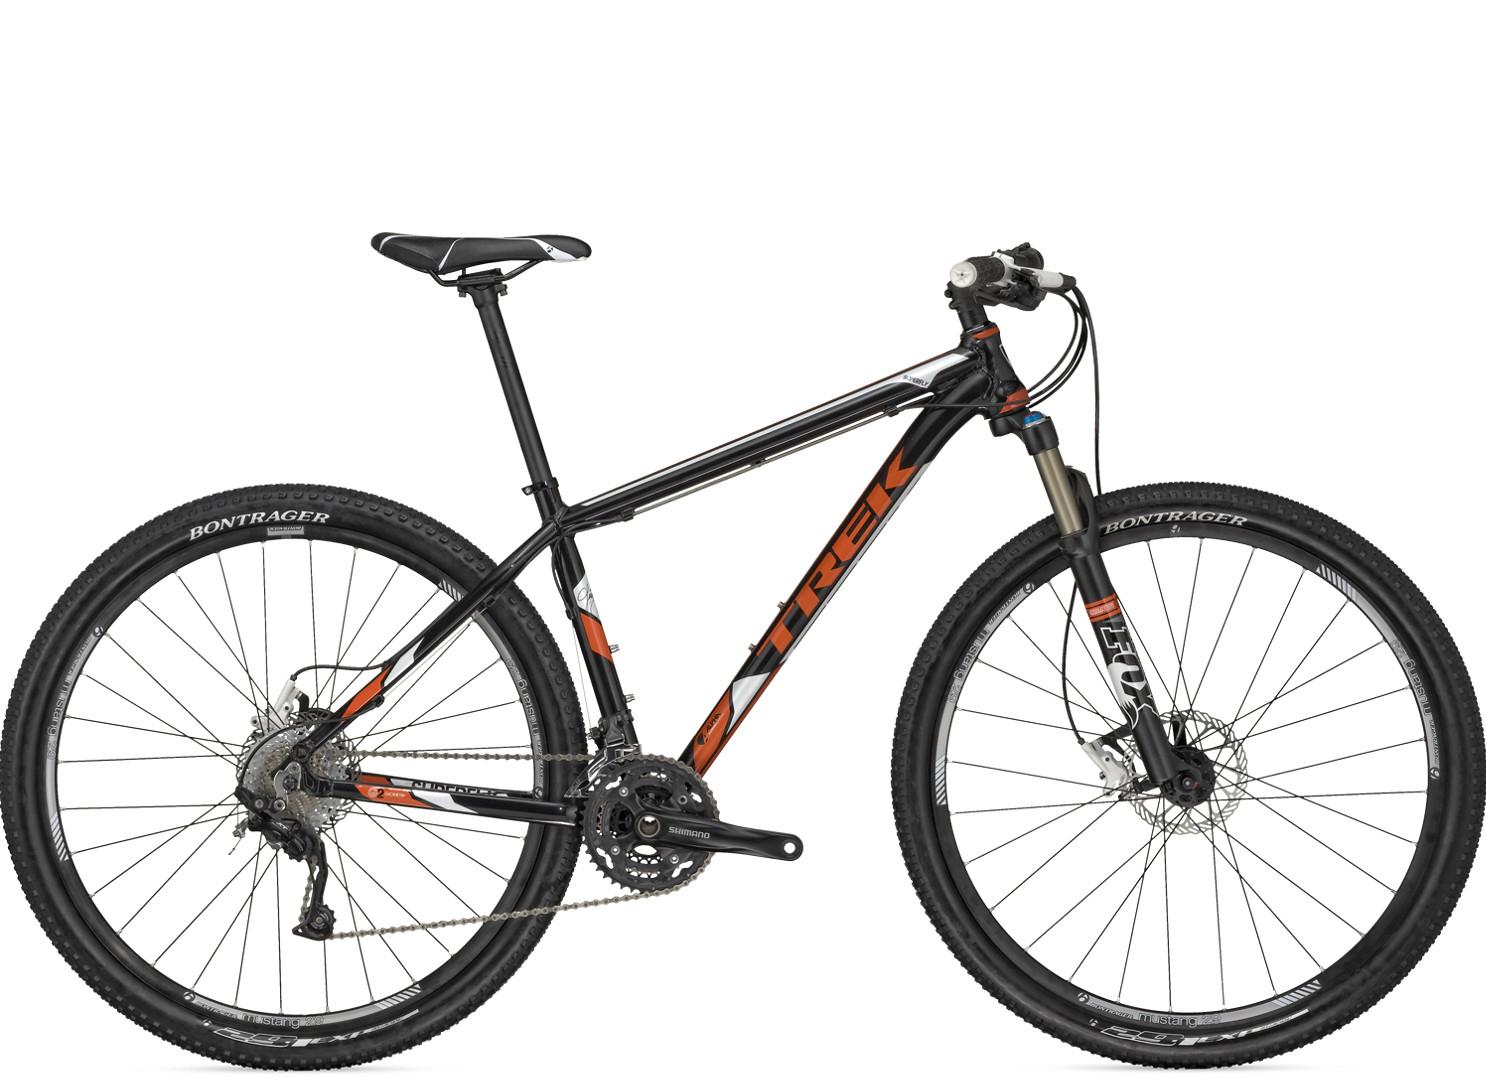 2012 Trek Superfly AL Bike 21077